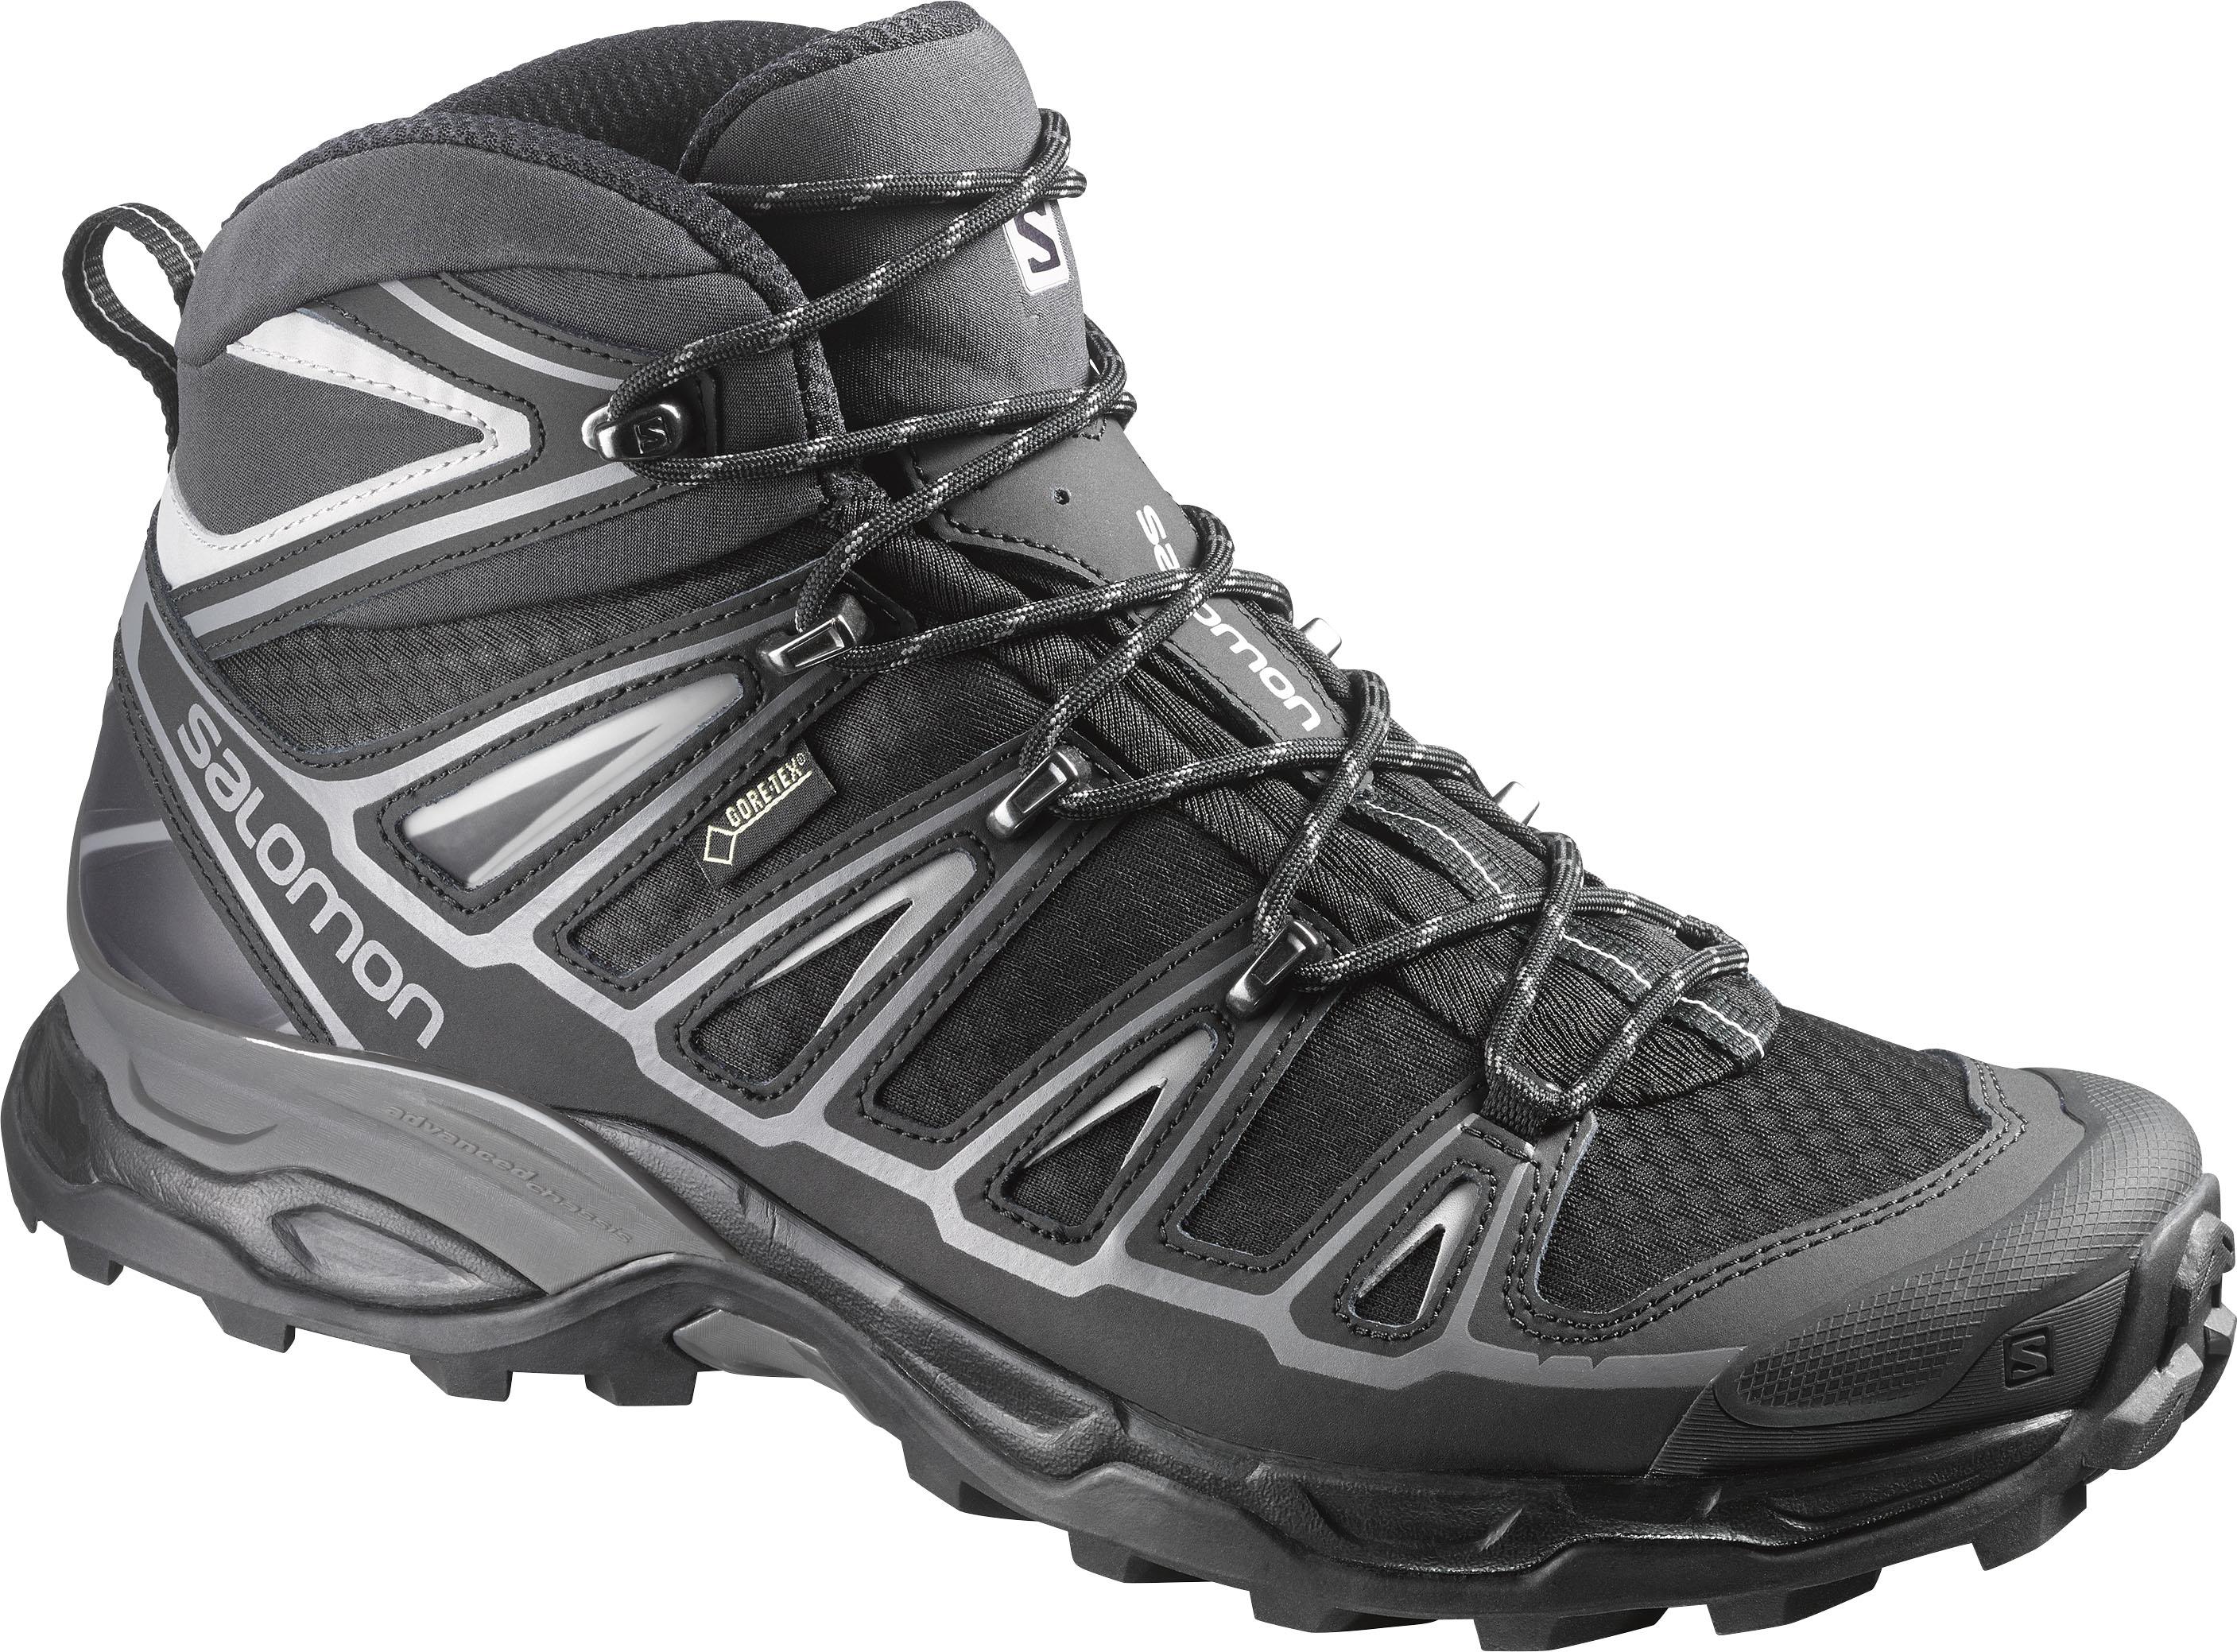 89c2a51499b3 Salomon X Ultra Mid 2 GTX Light Trail Shoes - Men s